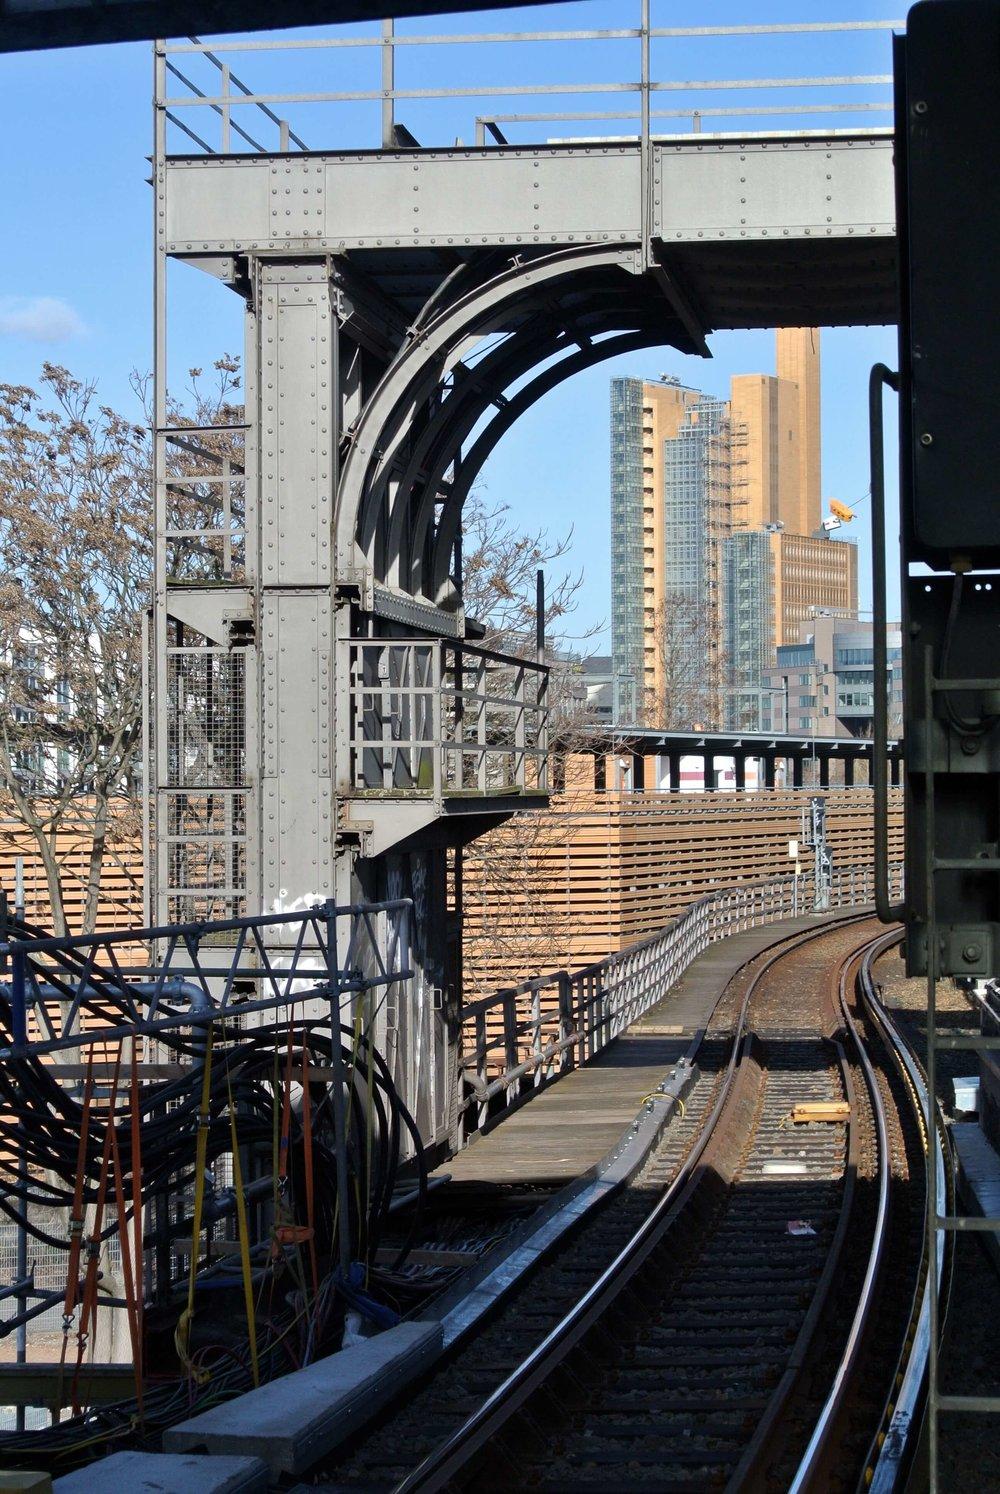 Train track Berlin